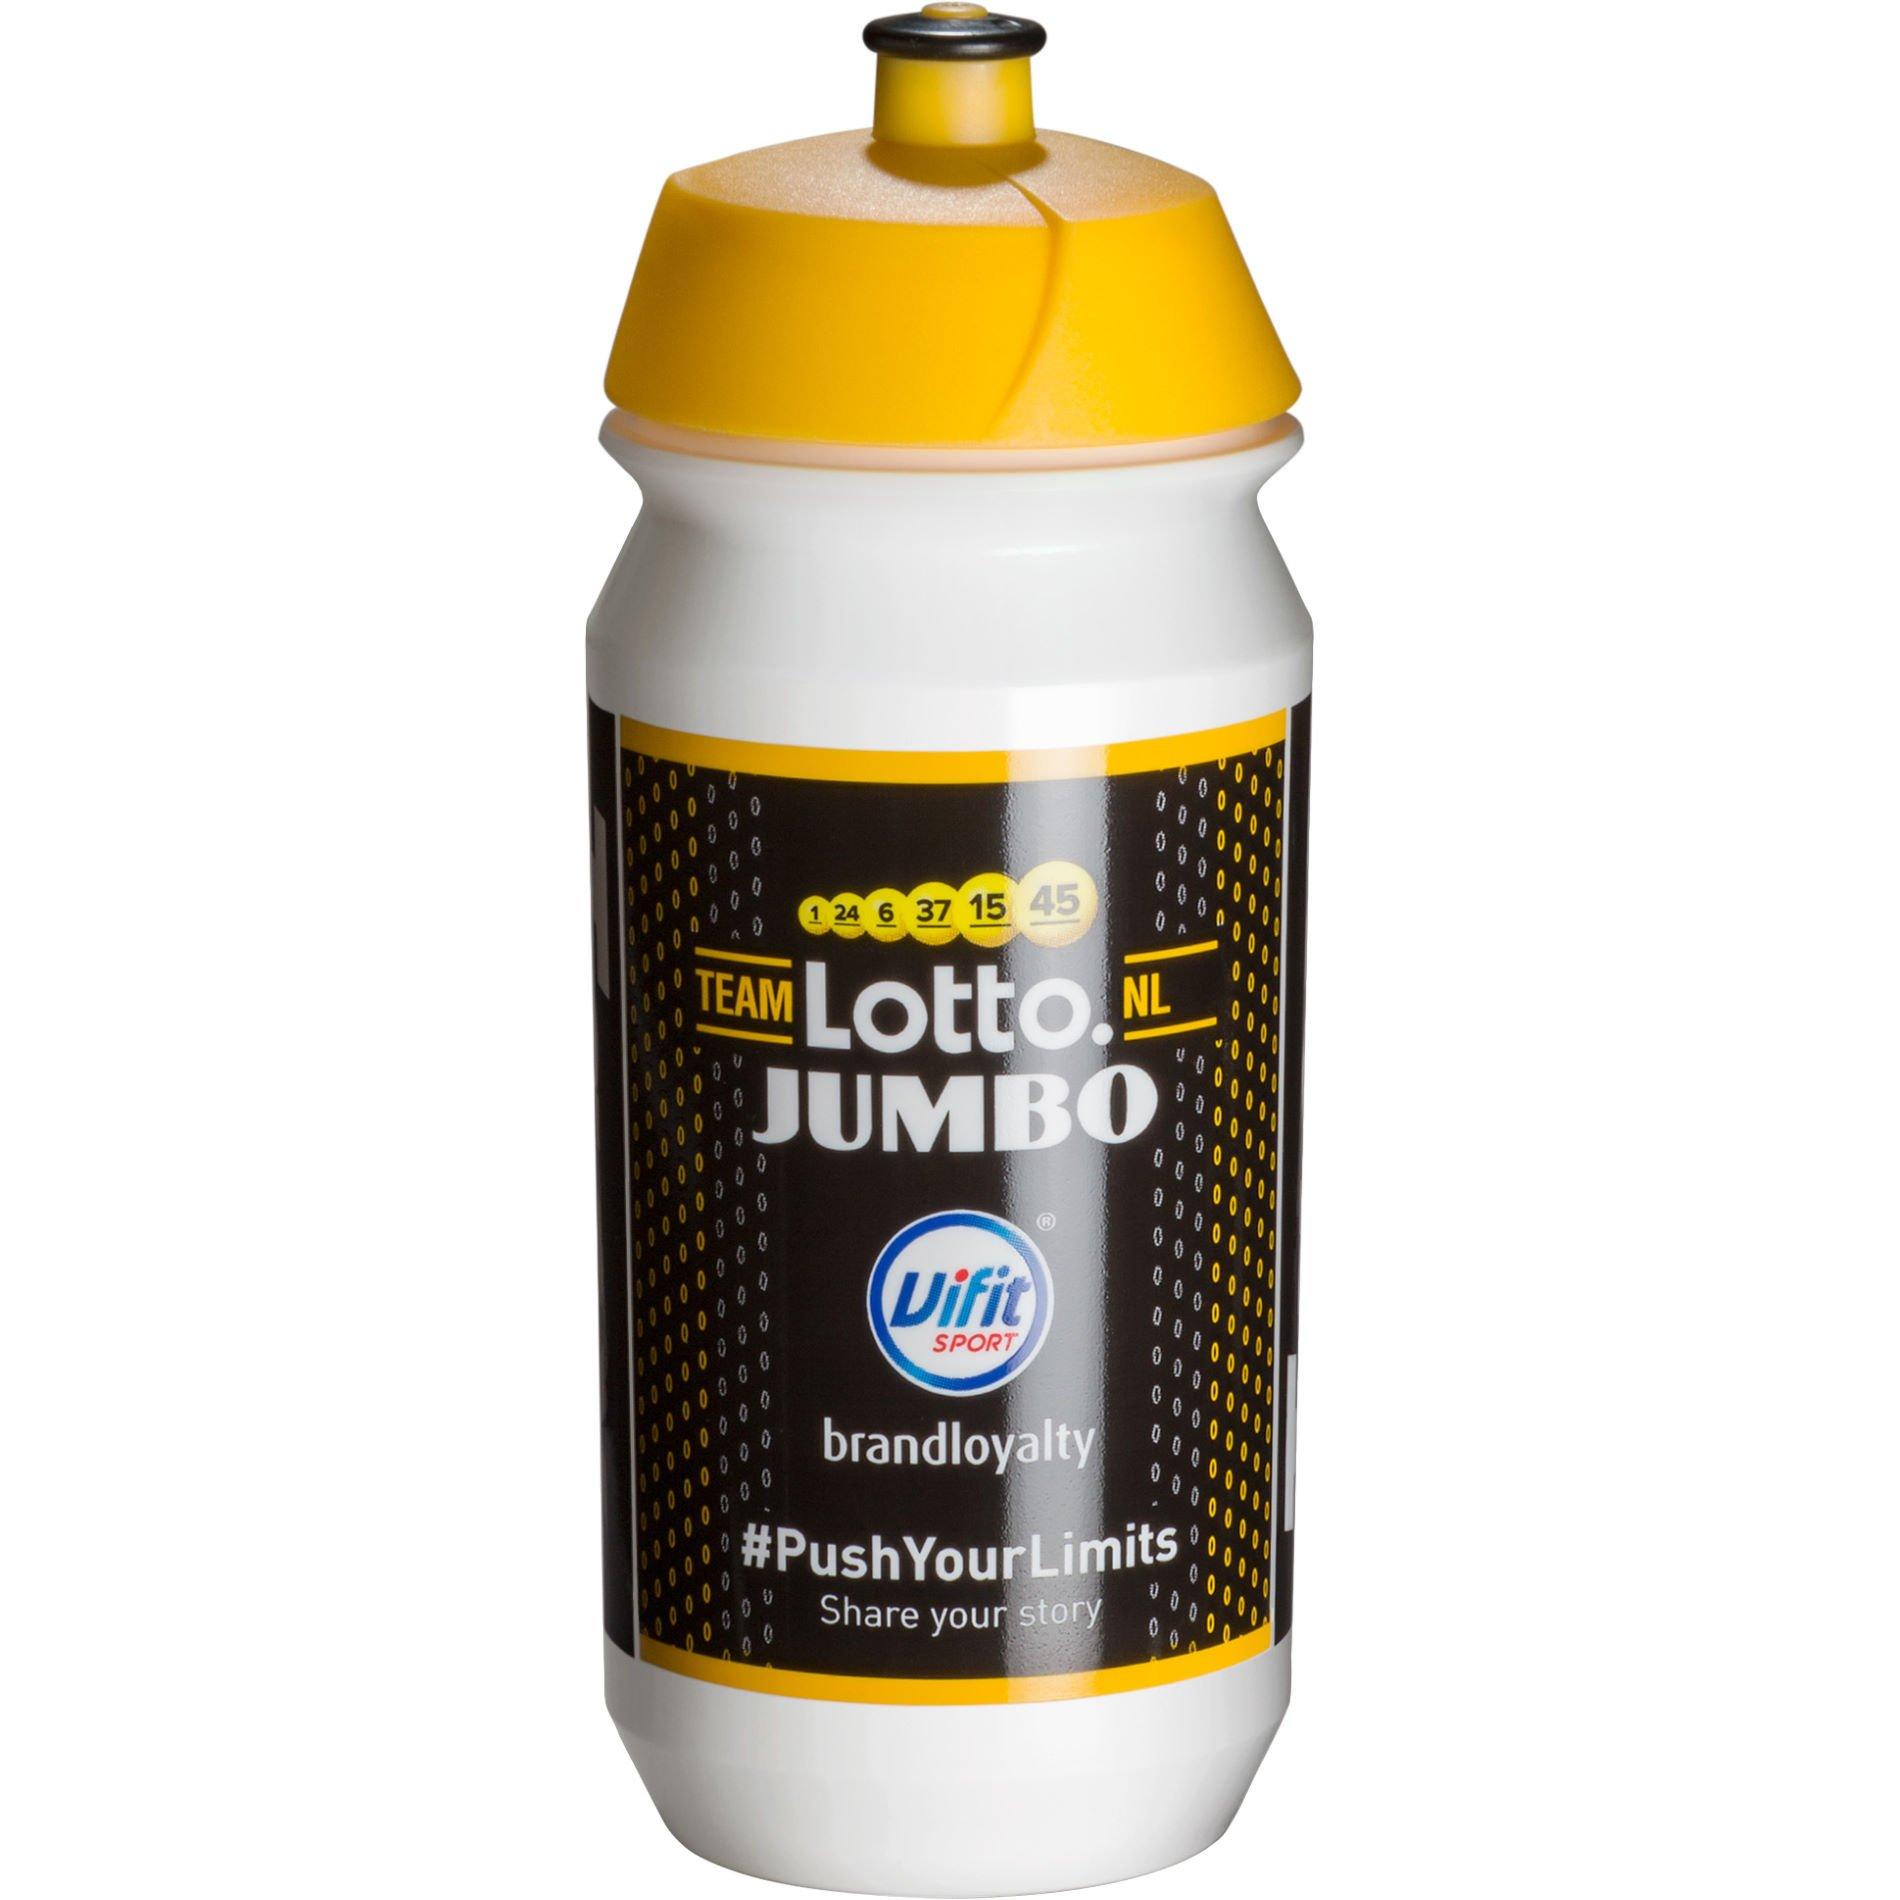 Tacx Lotto Jumbo 2018